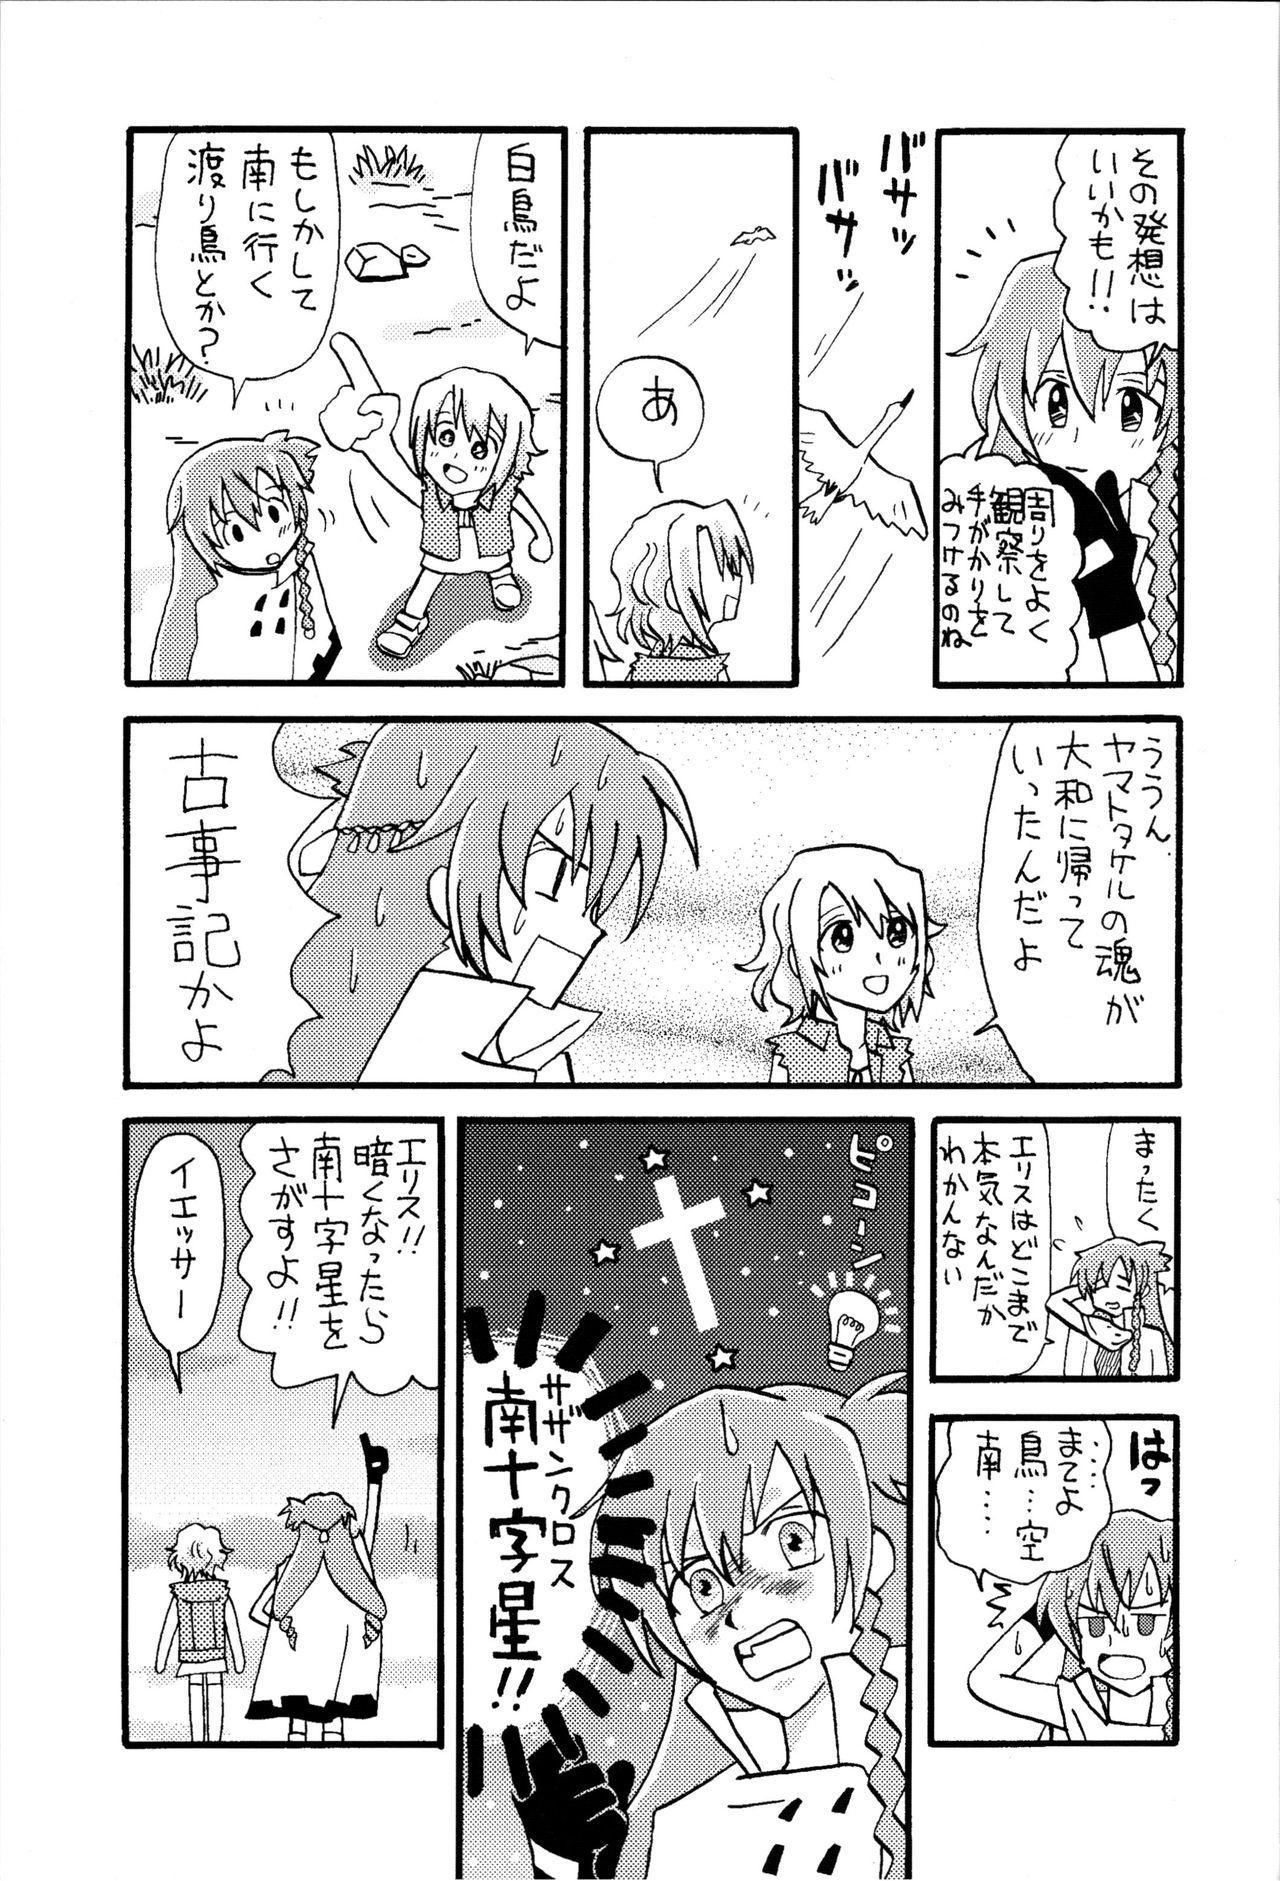 Minamikaze no Yukue 17